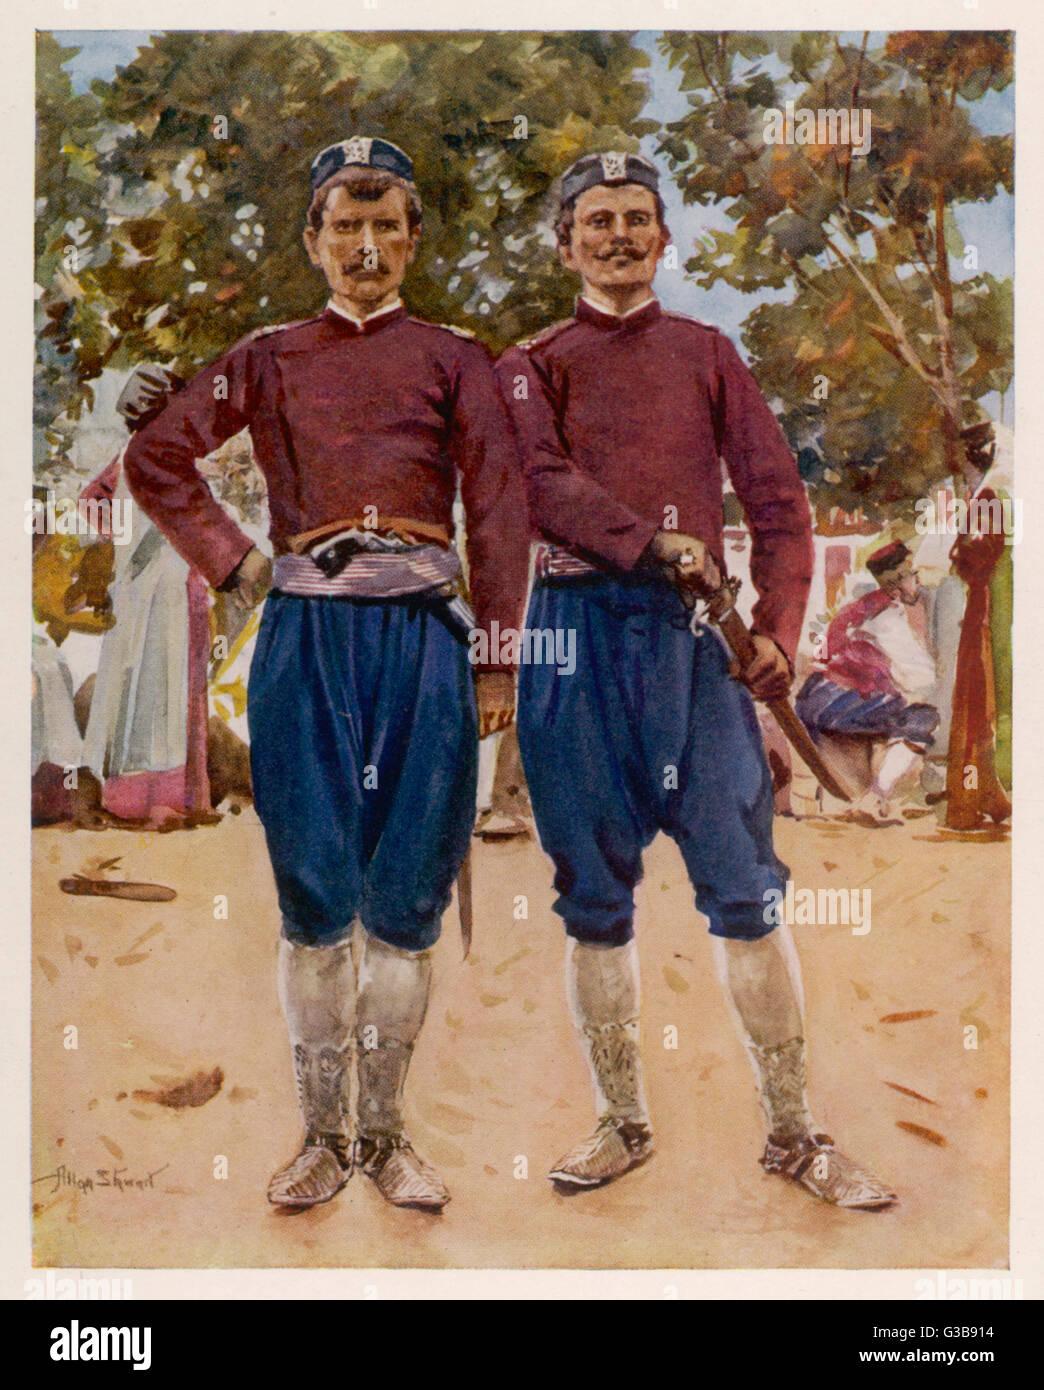 Montenegro warriors of the Black Mountains, Podgorica       Date: 1913 - Stock Image